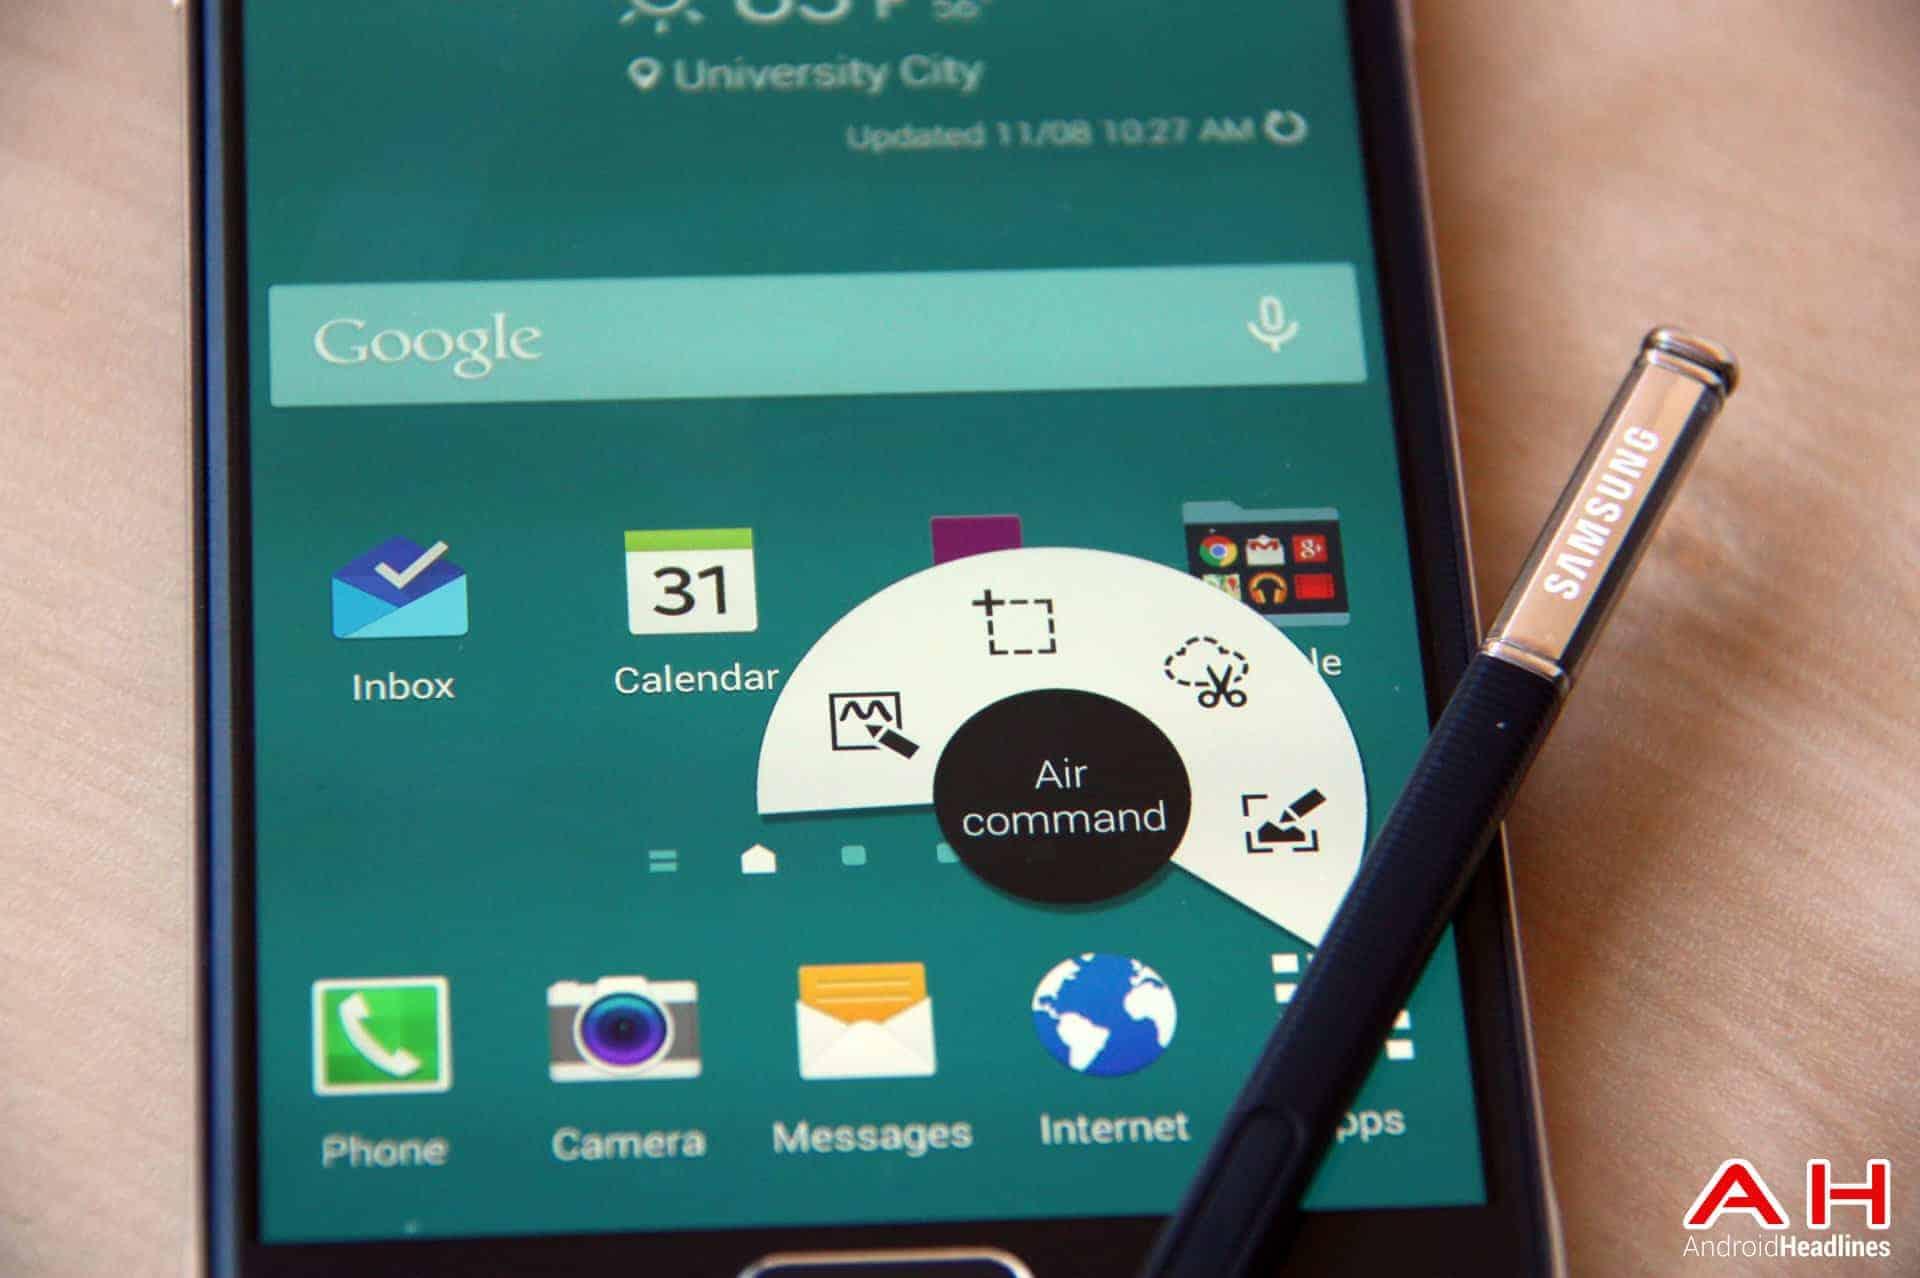 AH Samsung Galaxy Note 4 ah-3